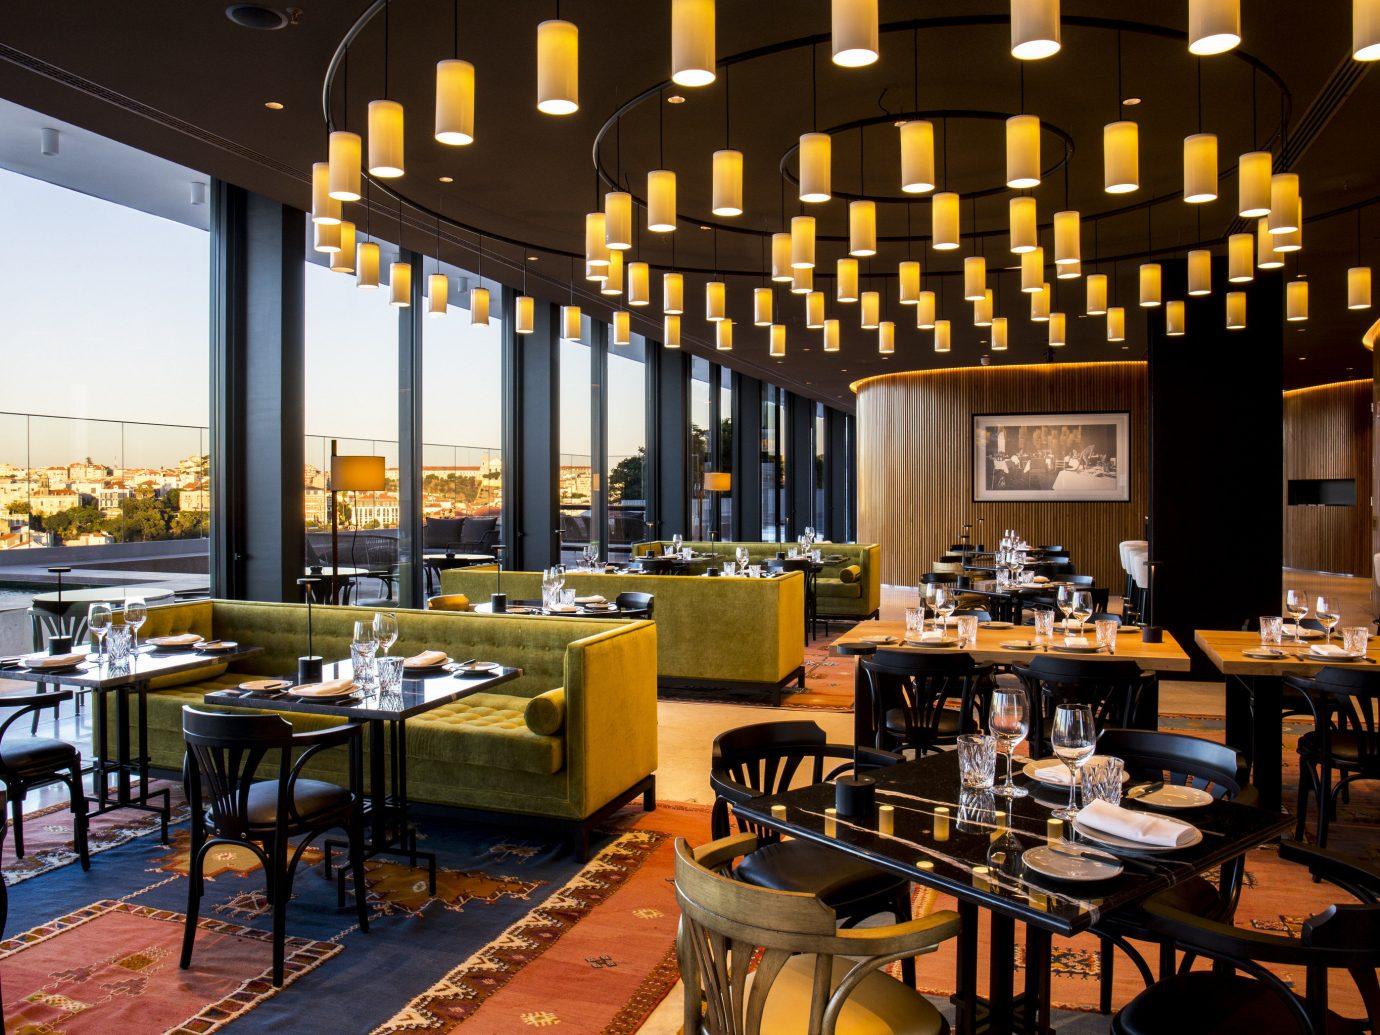 Trip Ideas table indoor restaurant meal café Resort Dining interior design Bar function hall estate cafeteria area dining room dining table